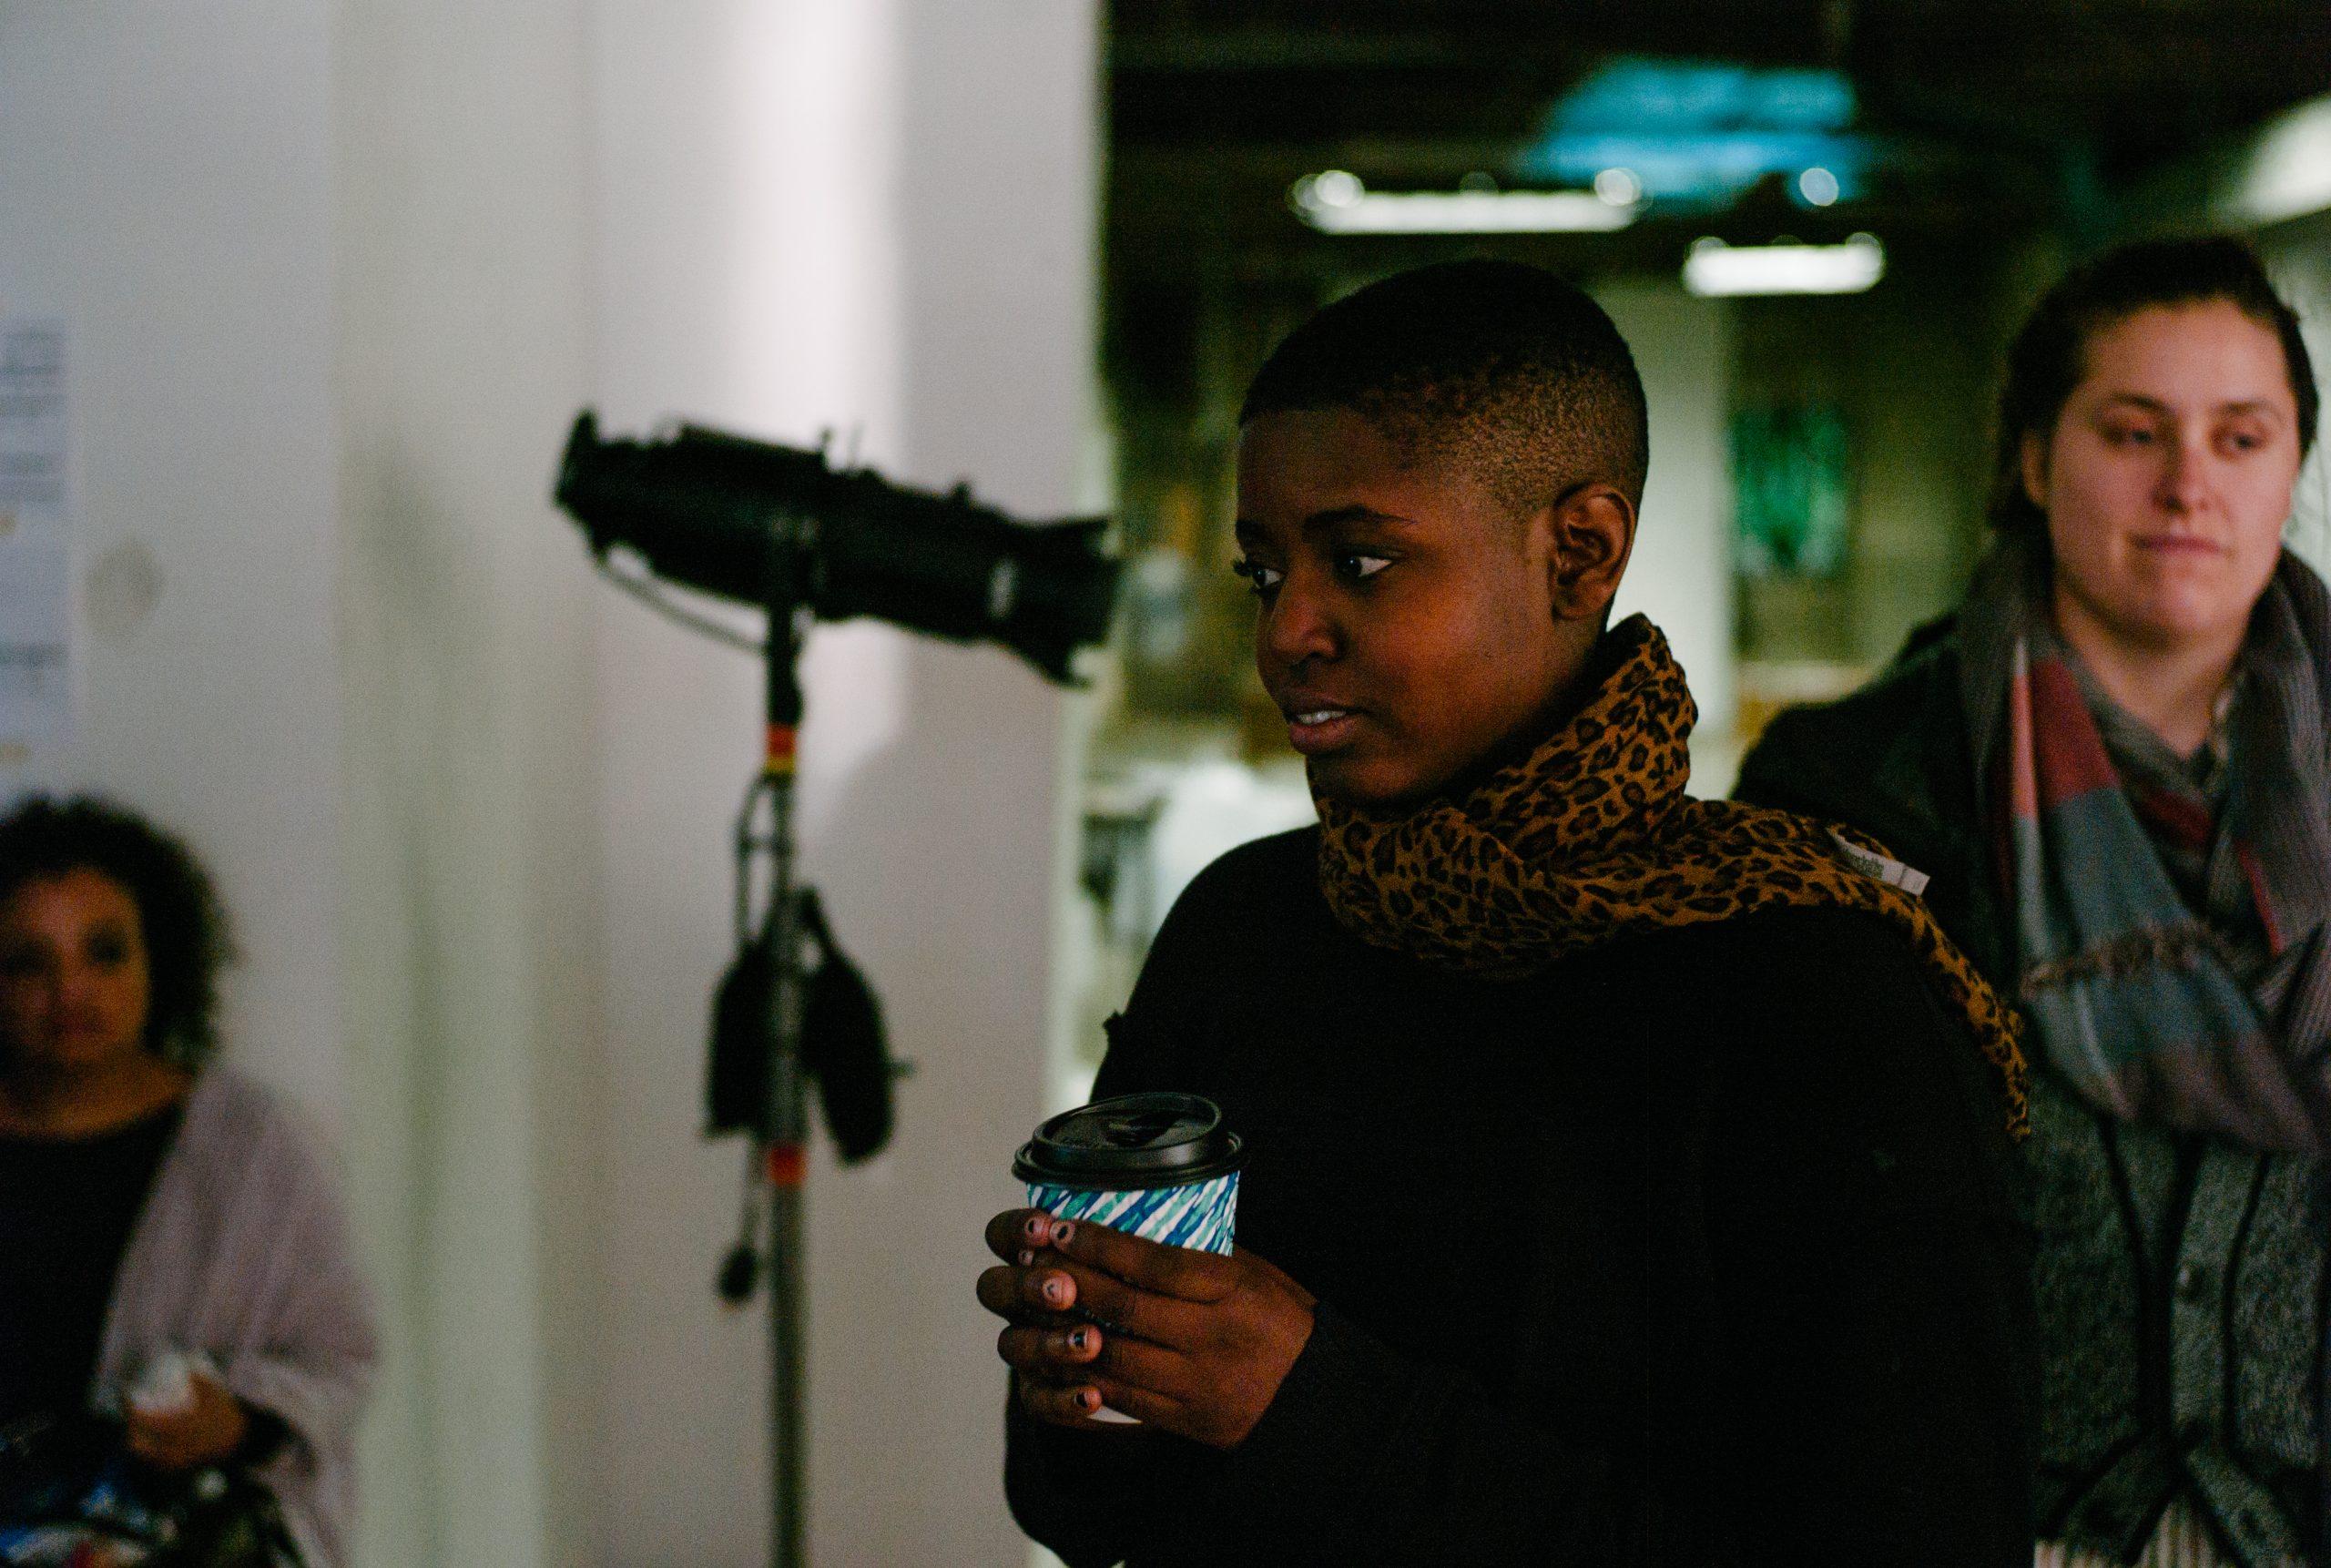 Video director Sam Bailey behind the scenes